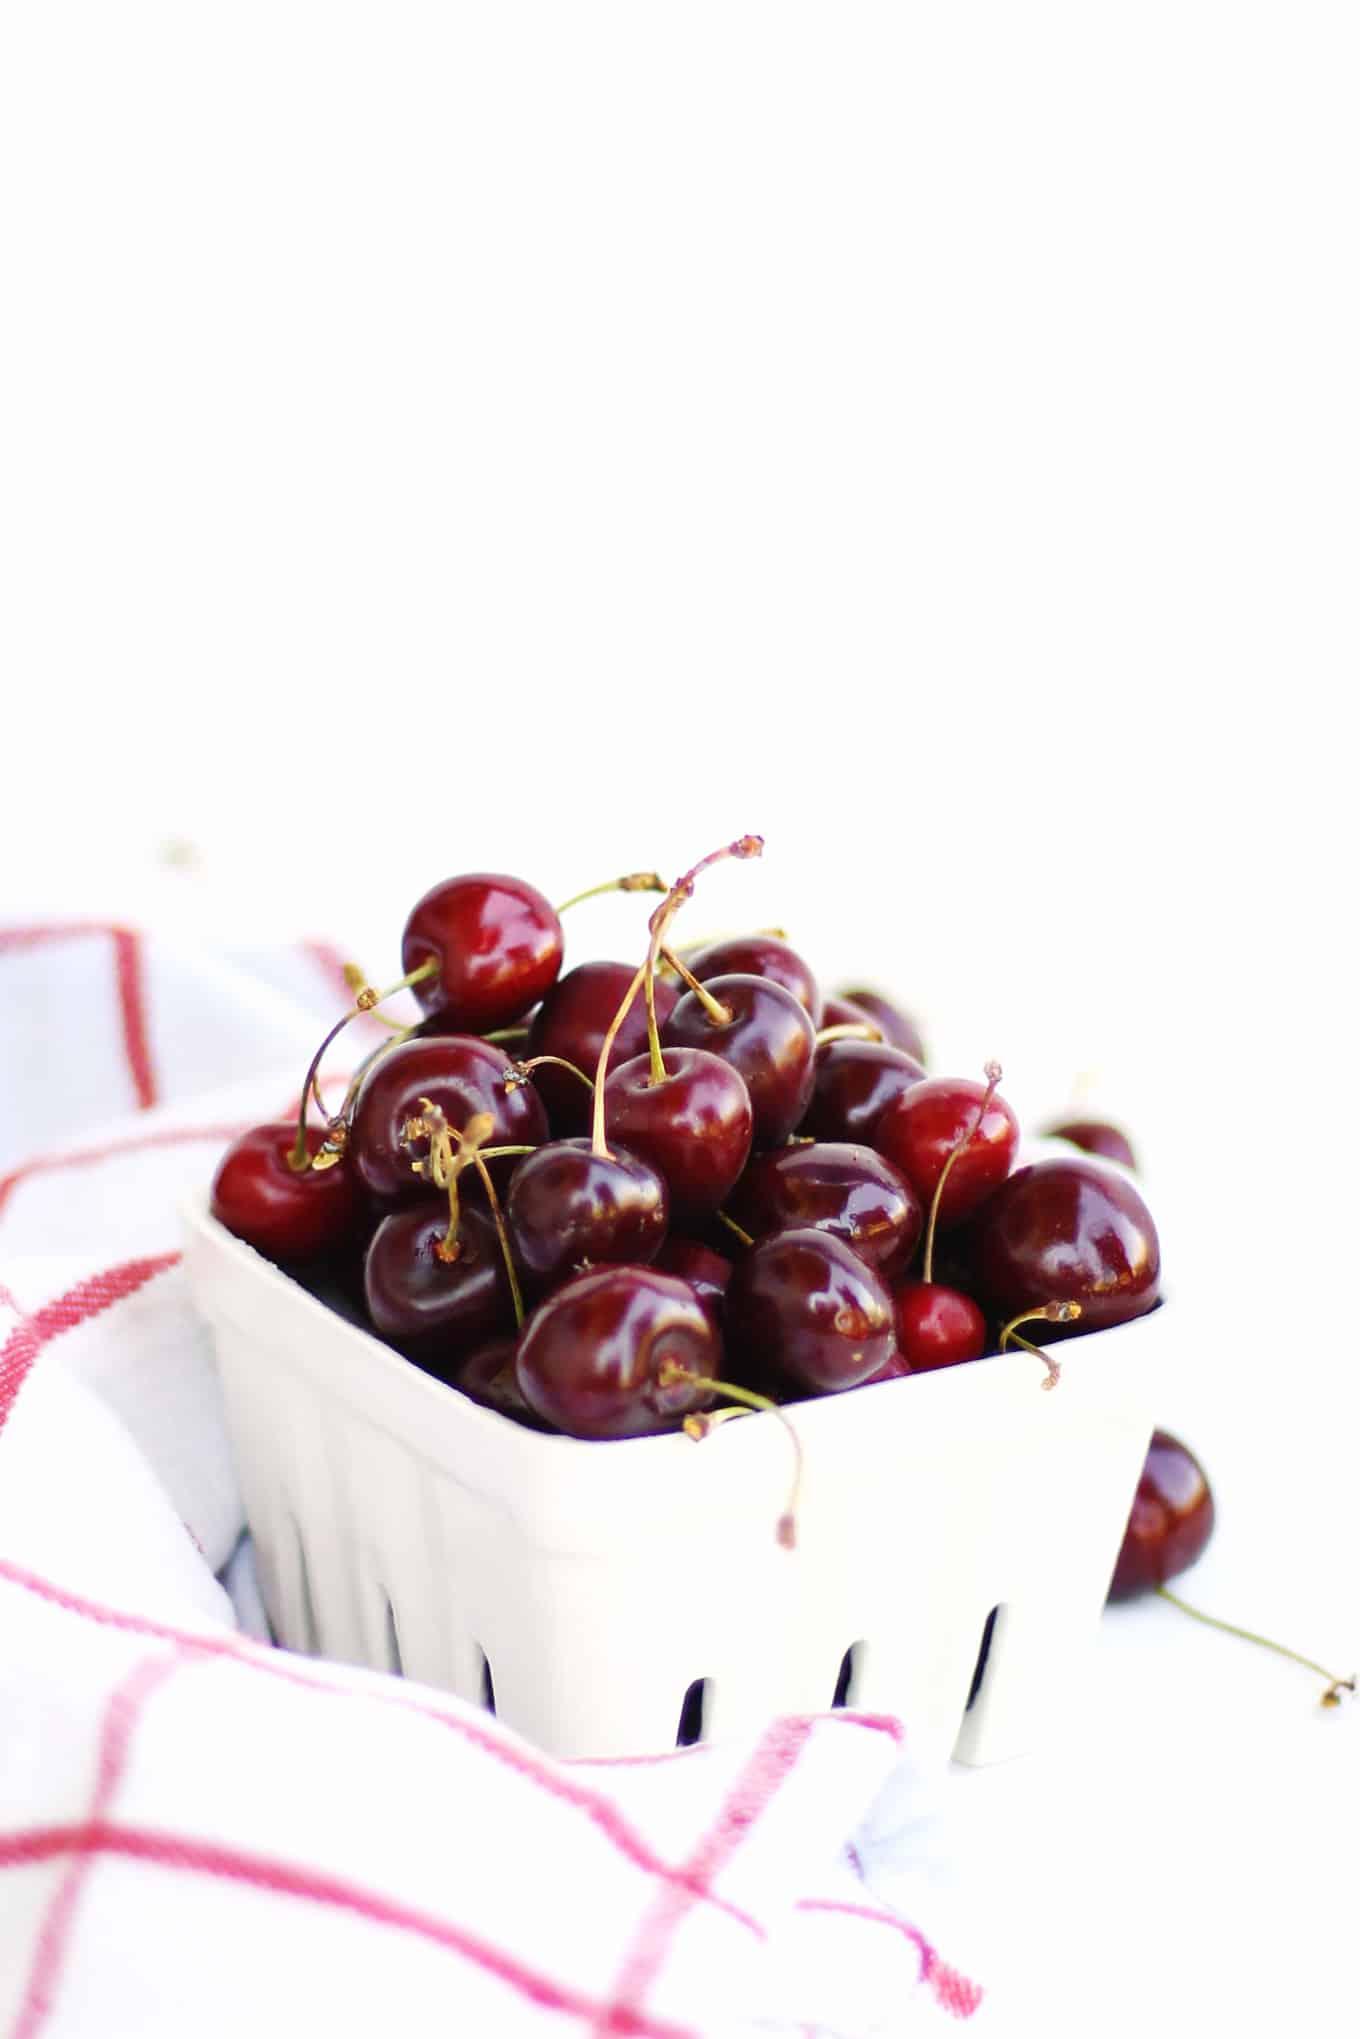 Cherries in a white farmers market basket